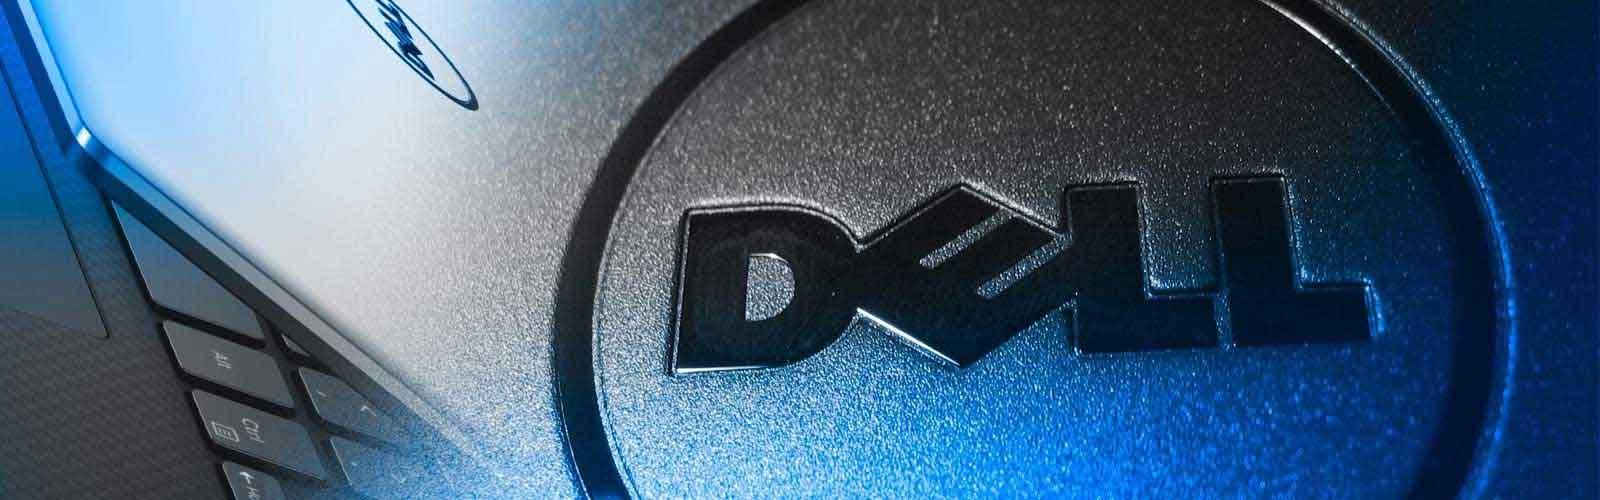 Servicio Técnico Portátiles Dell